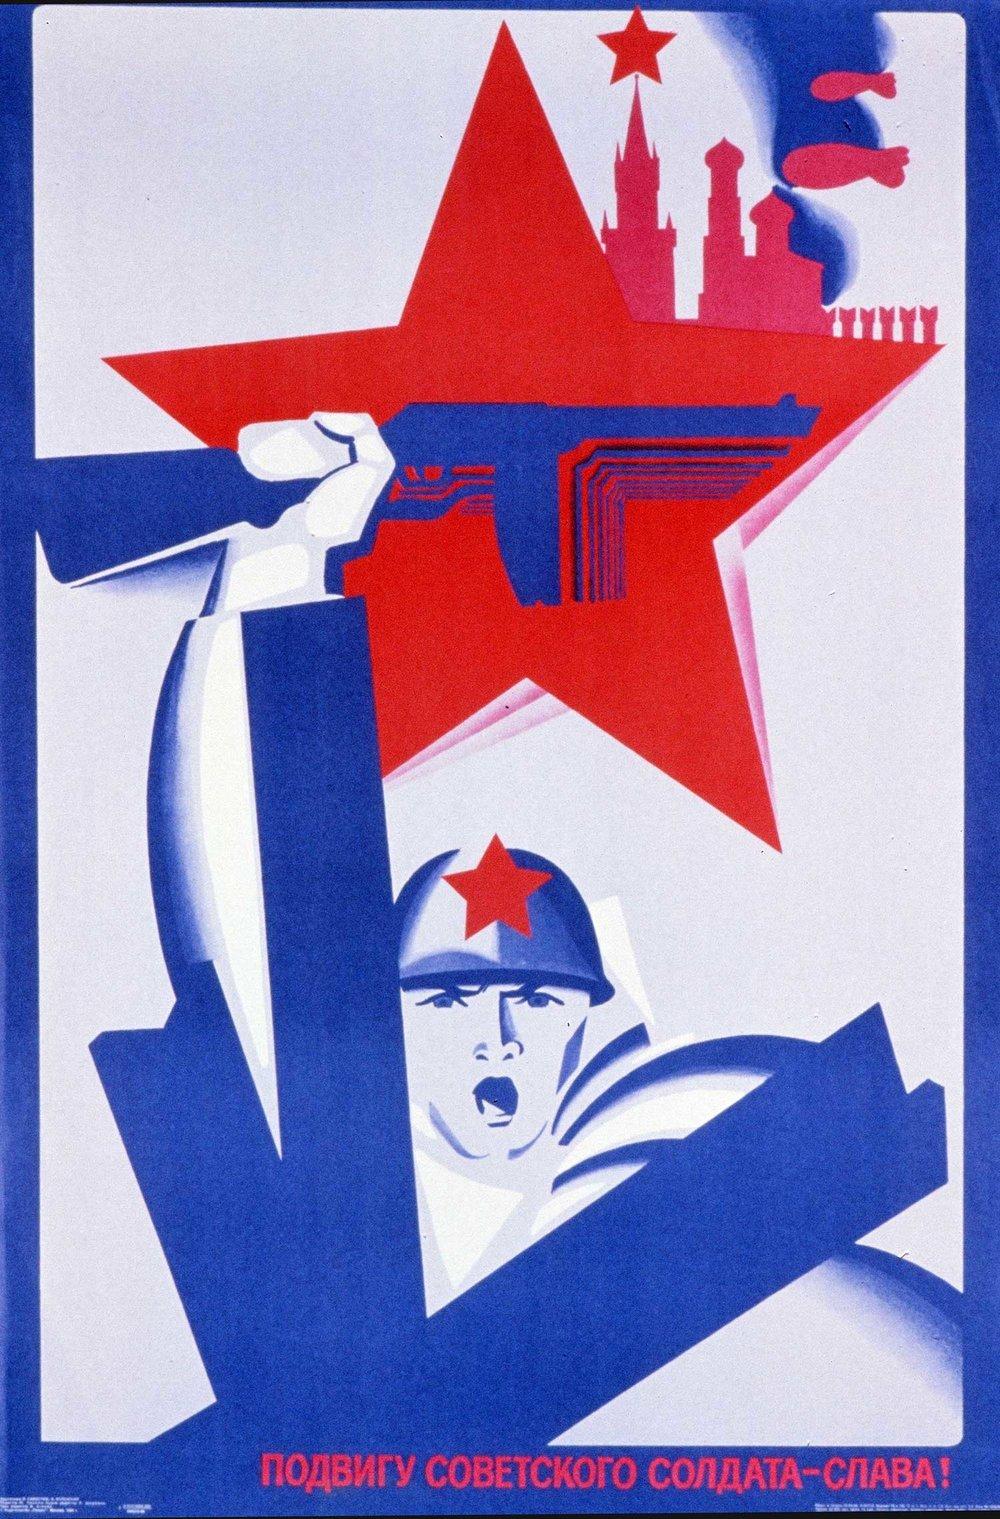 ron-miriello-grafico-soviet-posters-aiga-san-diego-community-design-Miriello-branding-officina-16.jpg